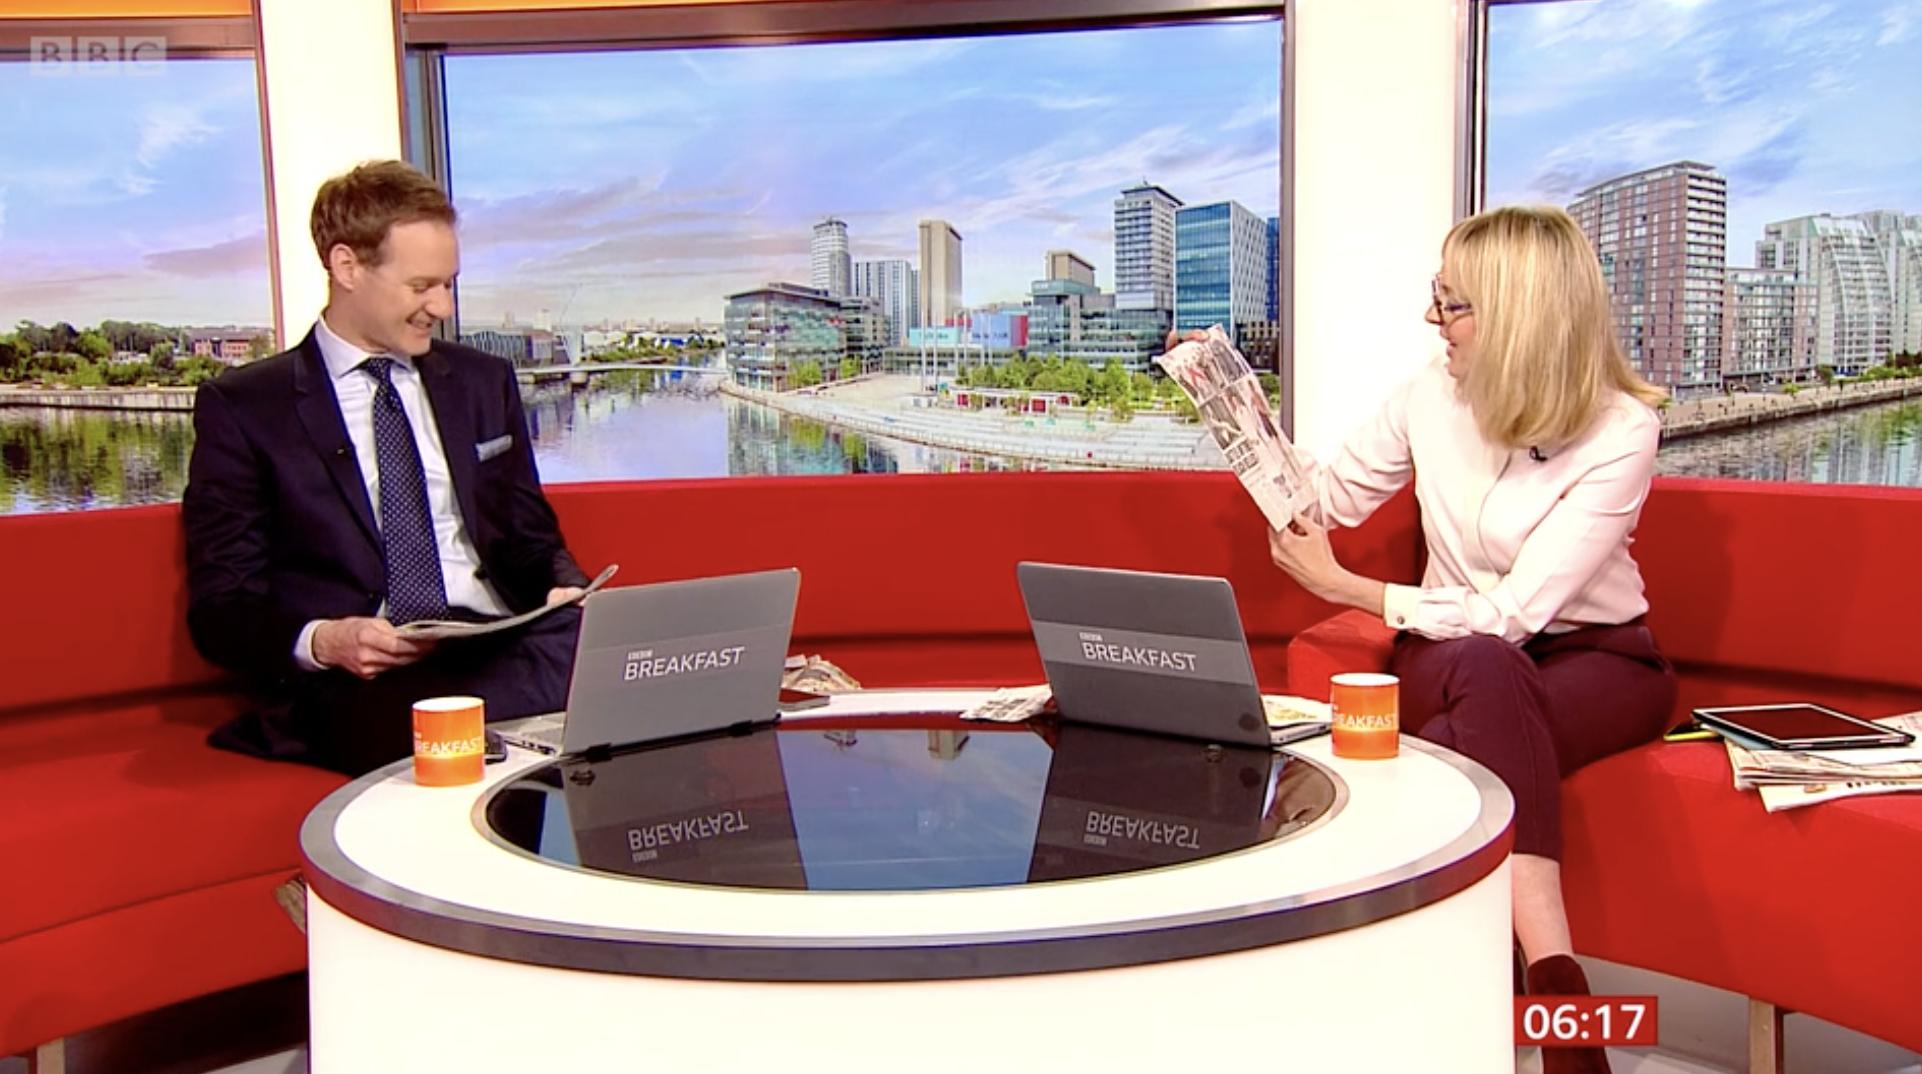 Vindication Swim Featured on BBC Breakfast